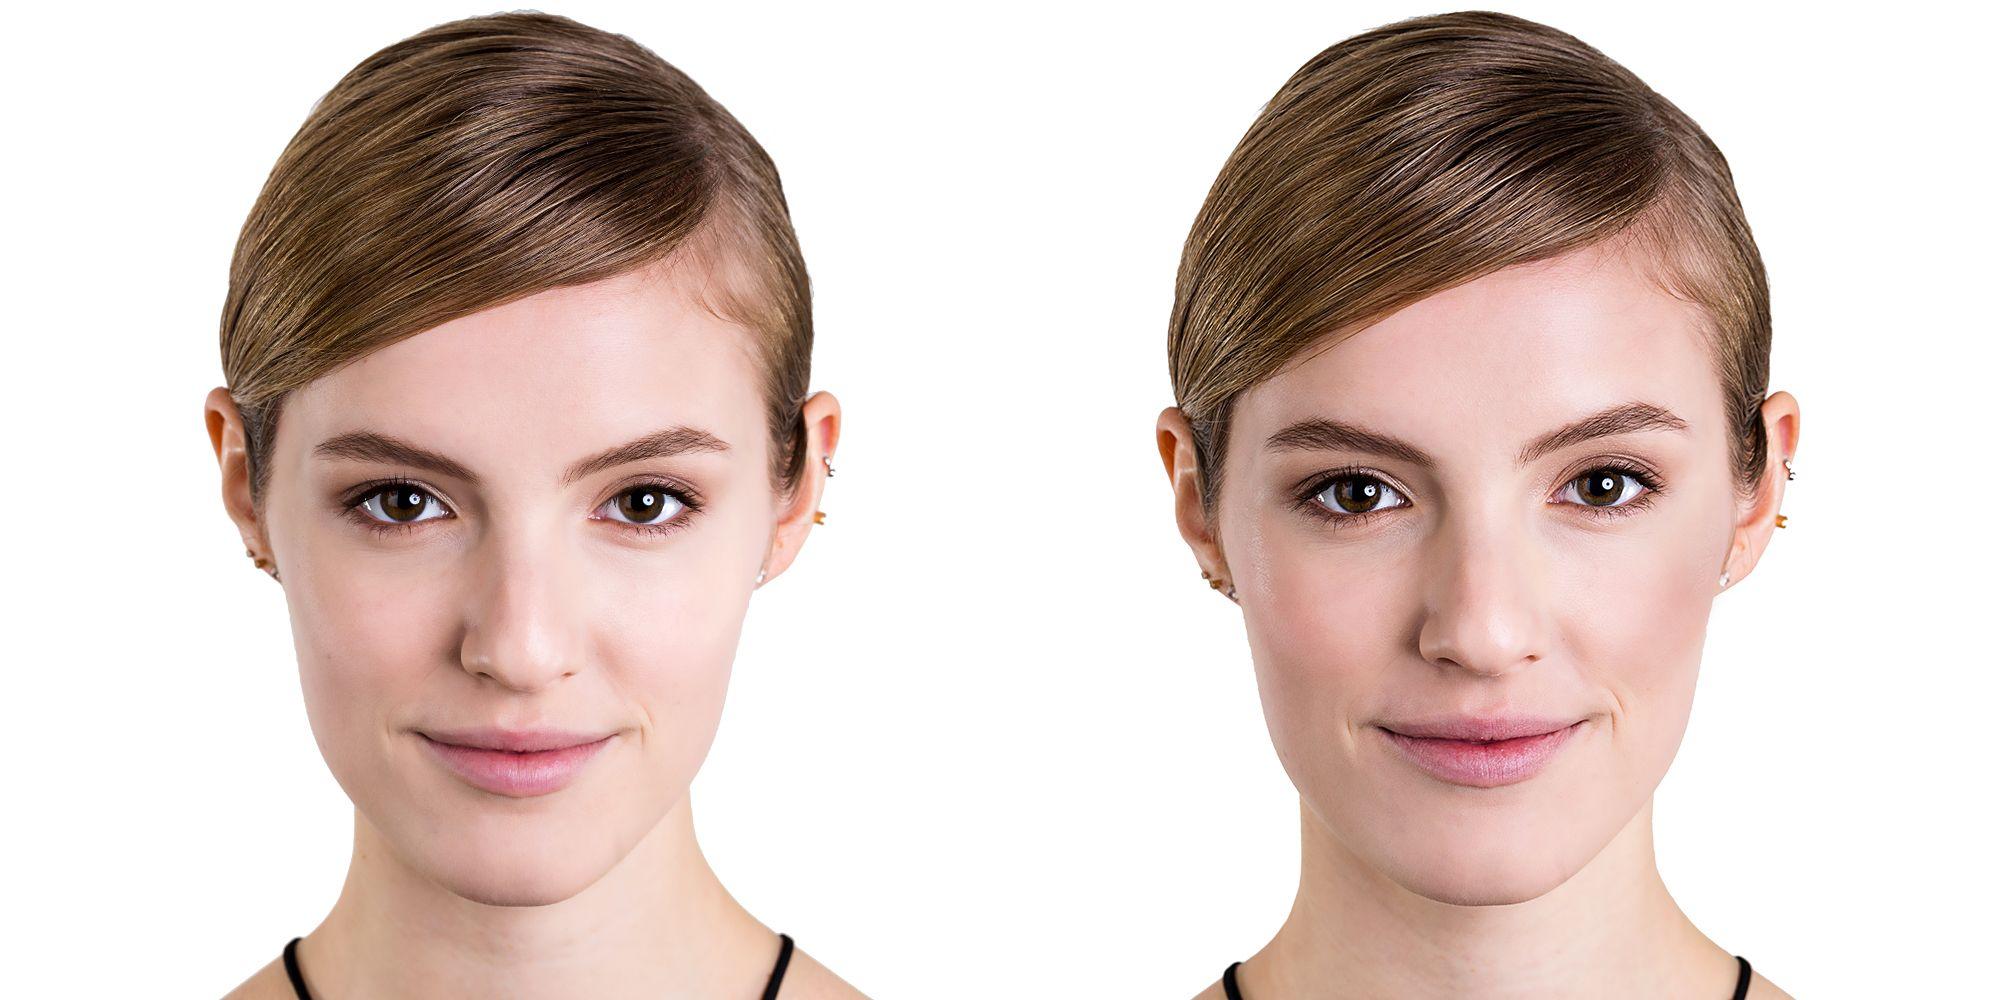 Get Defined Cheekbones In 4 QuickSteps